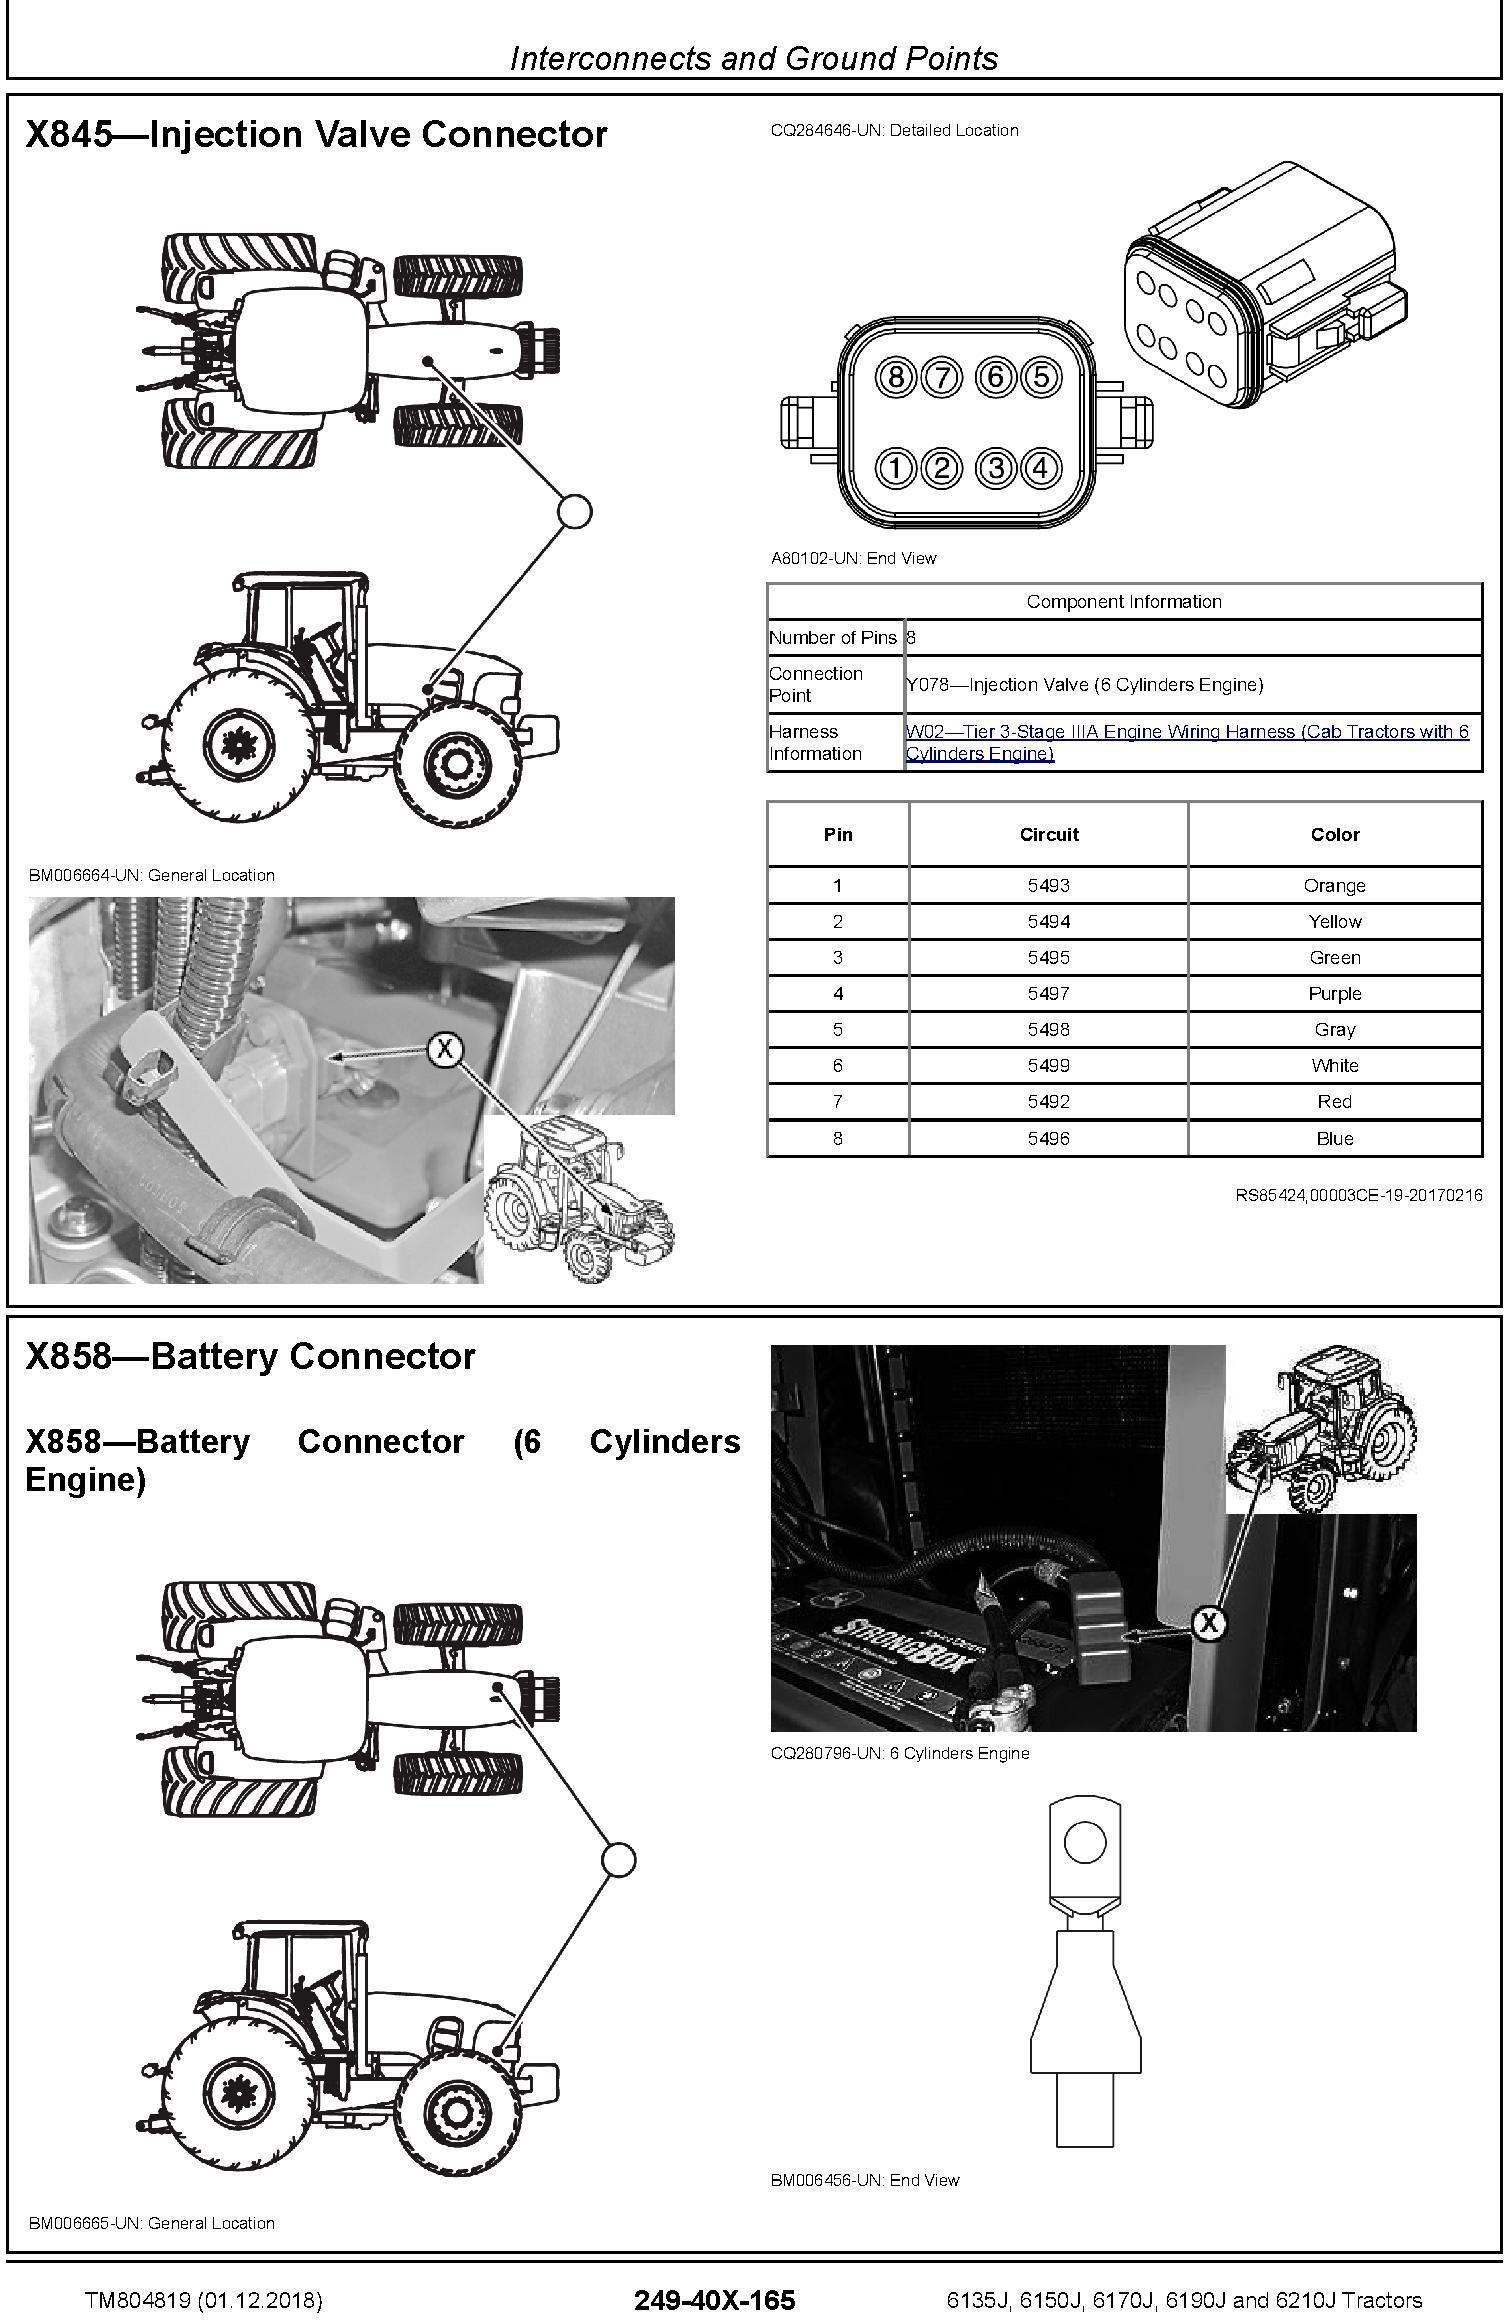 John Deere 6135J, 6150J, 6170J, 6190J, 6210J Tractors Diagnostic Technical Service Manual (TM804819) - 1